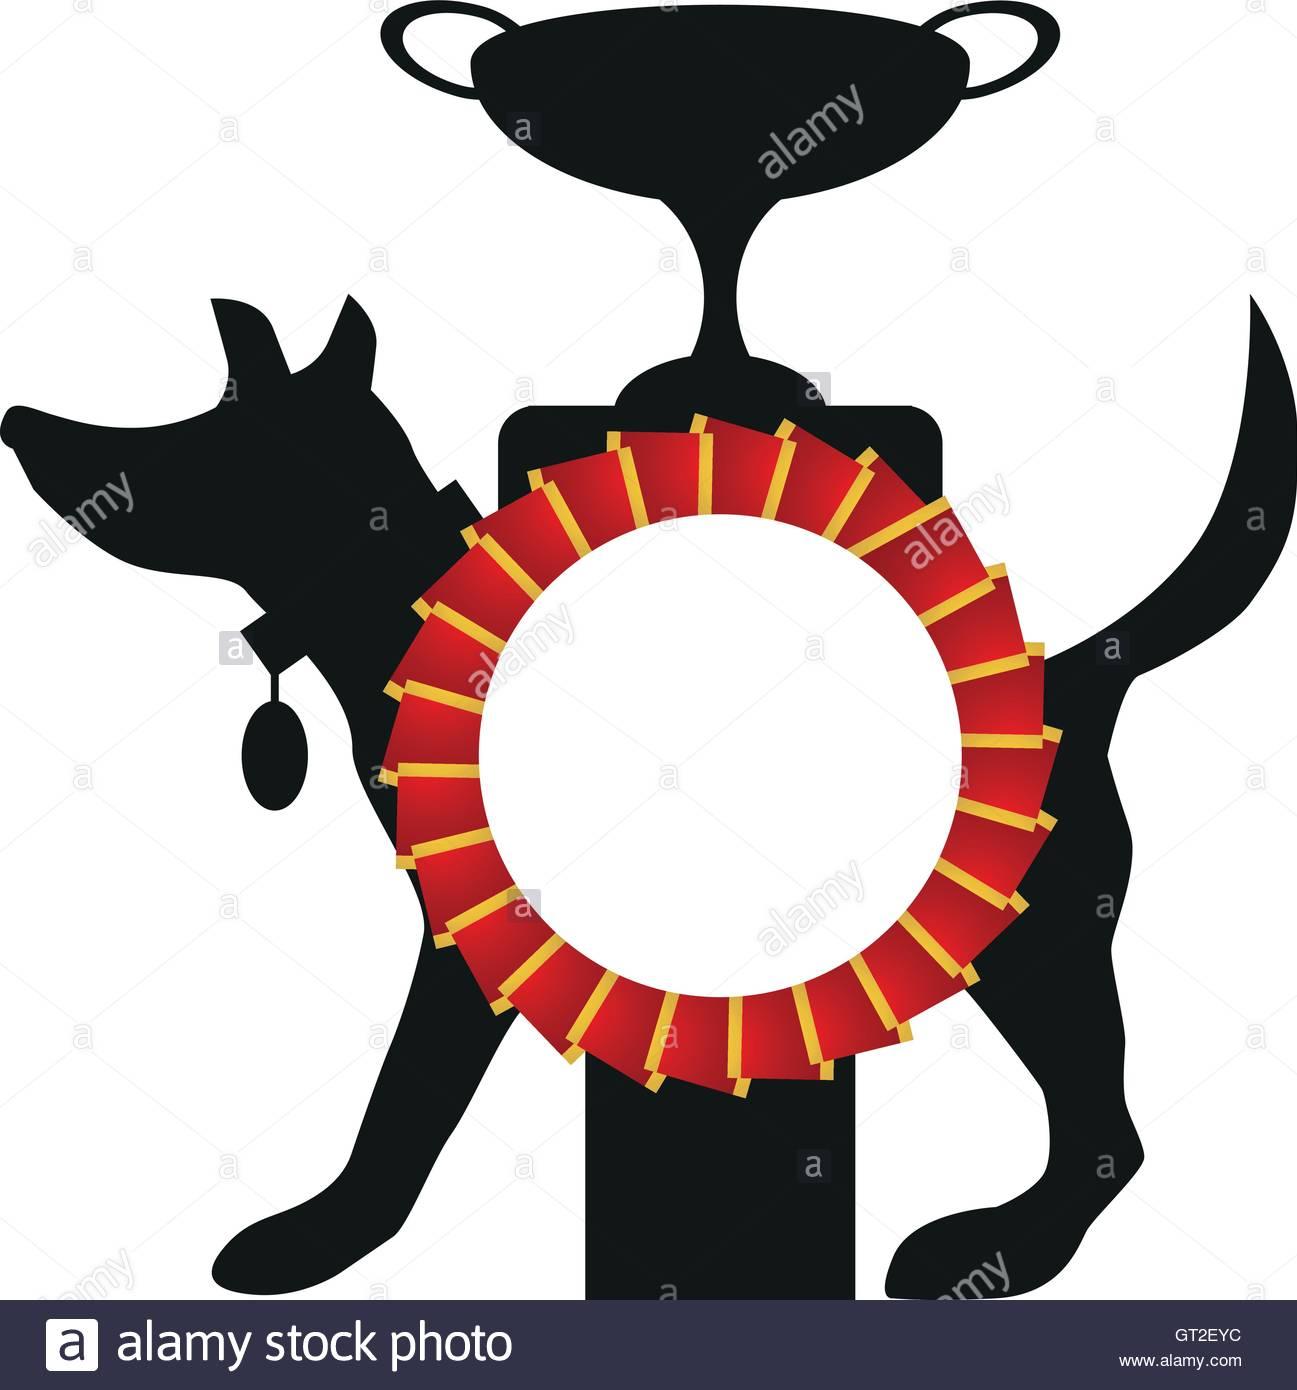 1297x1390 Dog Award Winner Rosette, Cup And Dog Silhouette Stock Vector Art